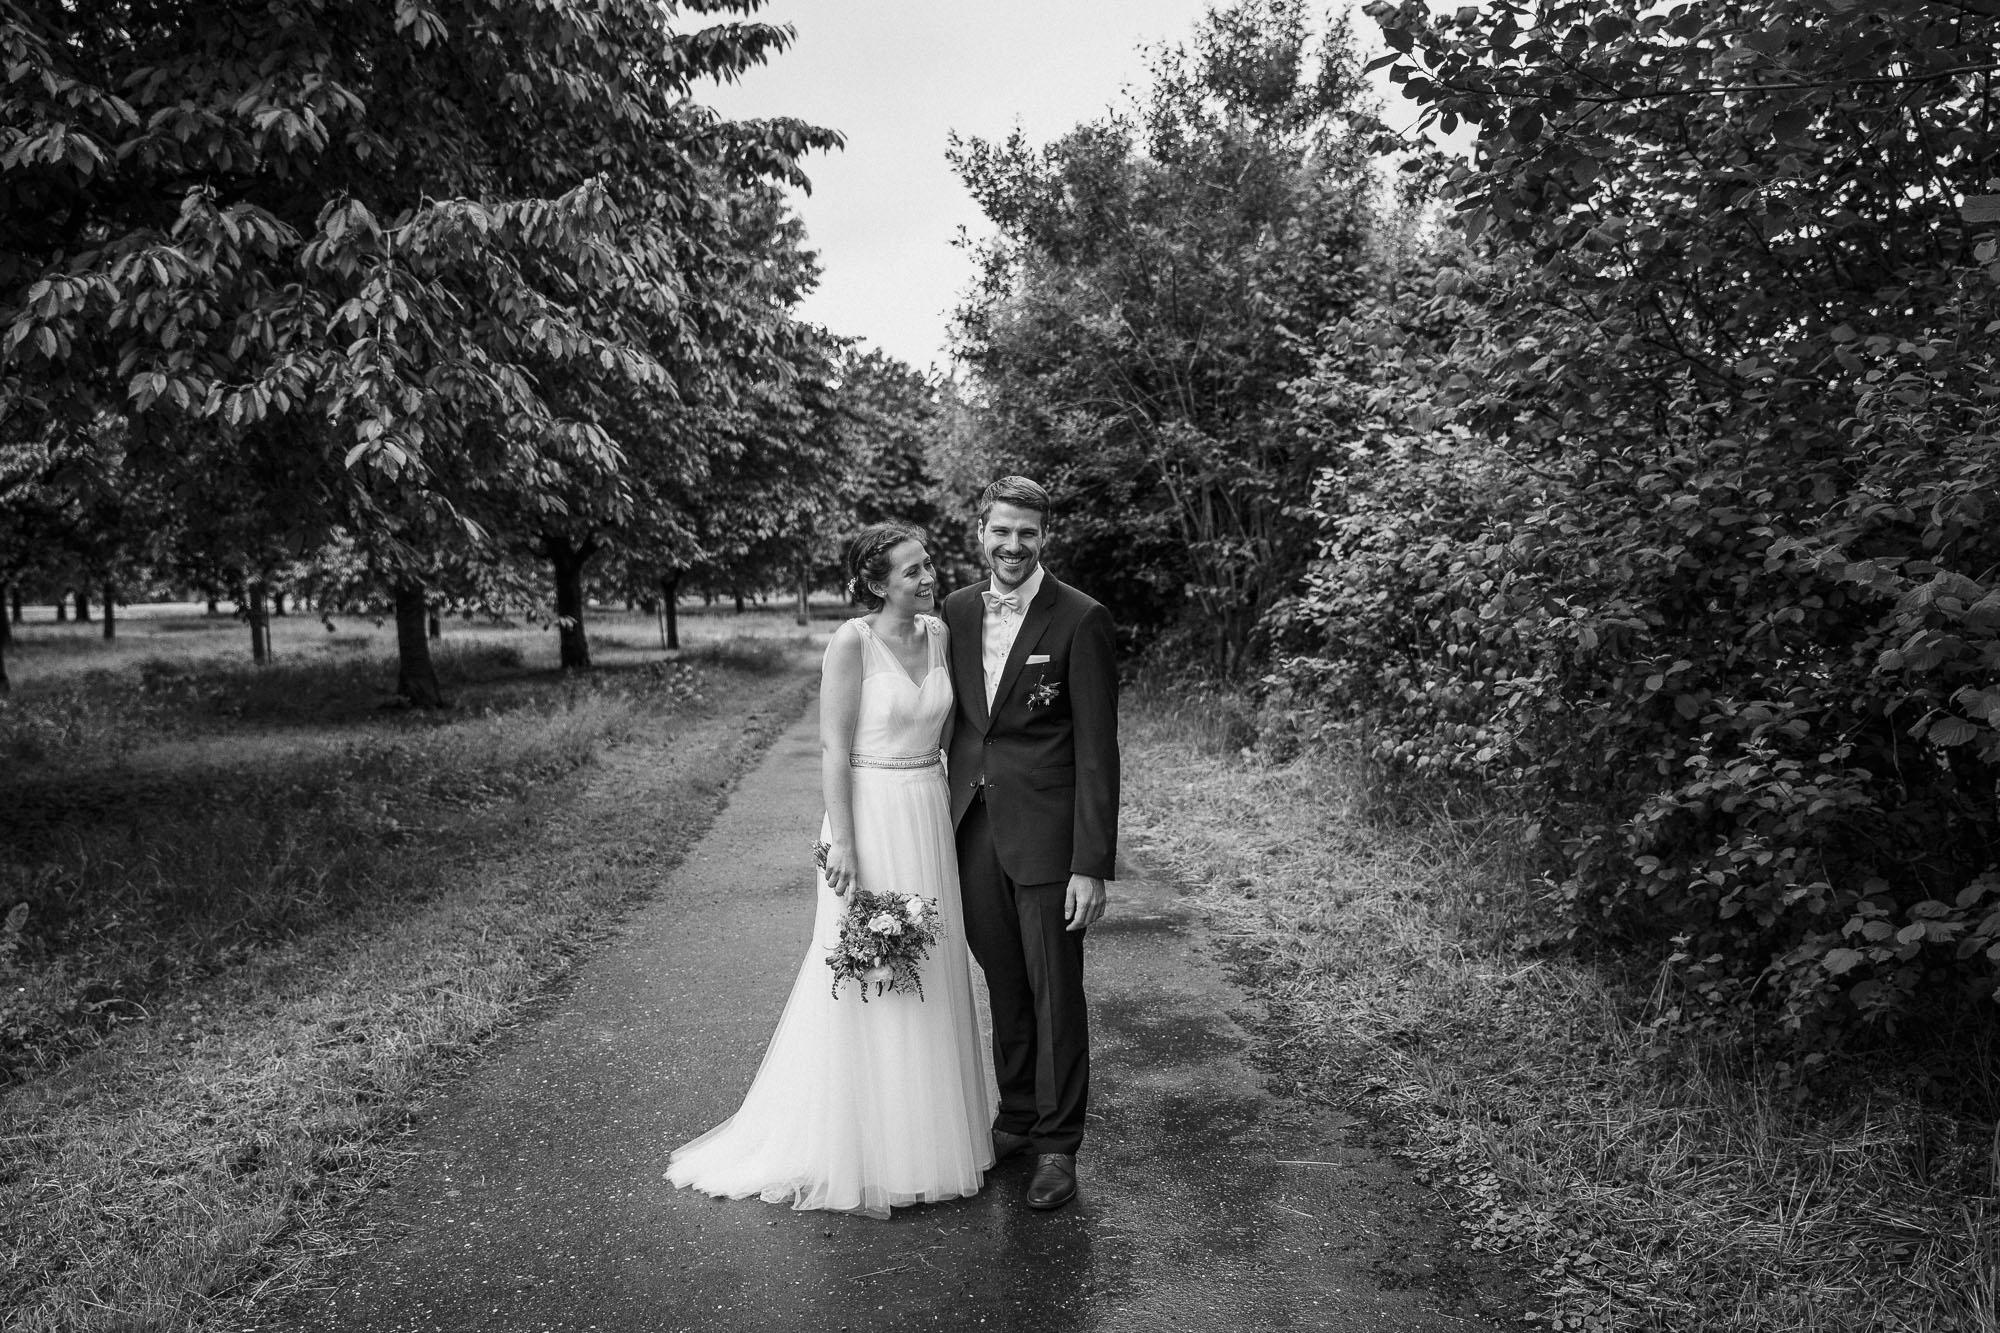 raissa simon photography destination wedding munich black forest offenburg 019 - Claudia + Christoph